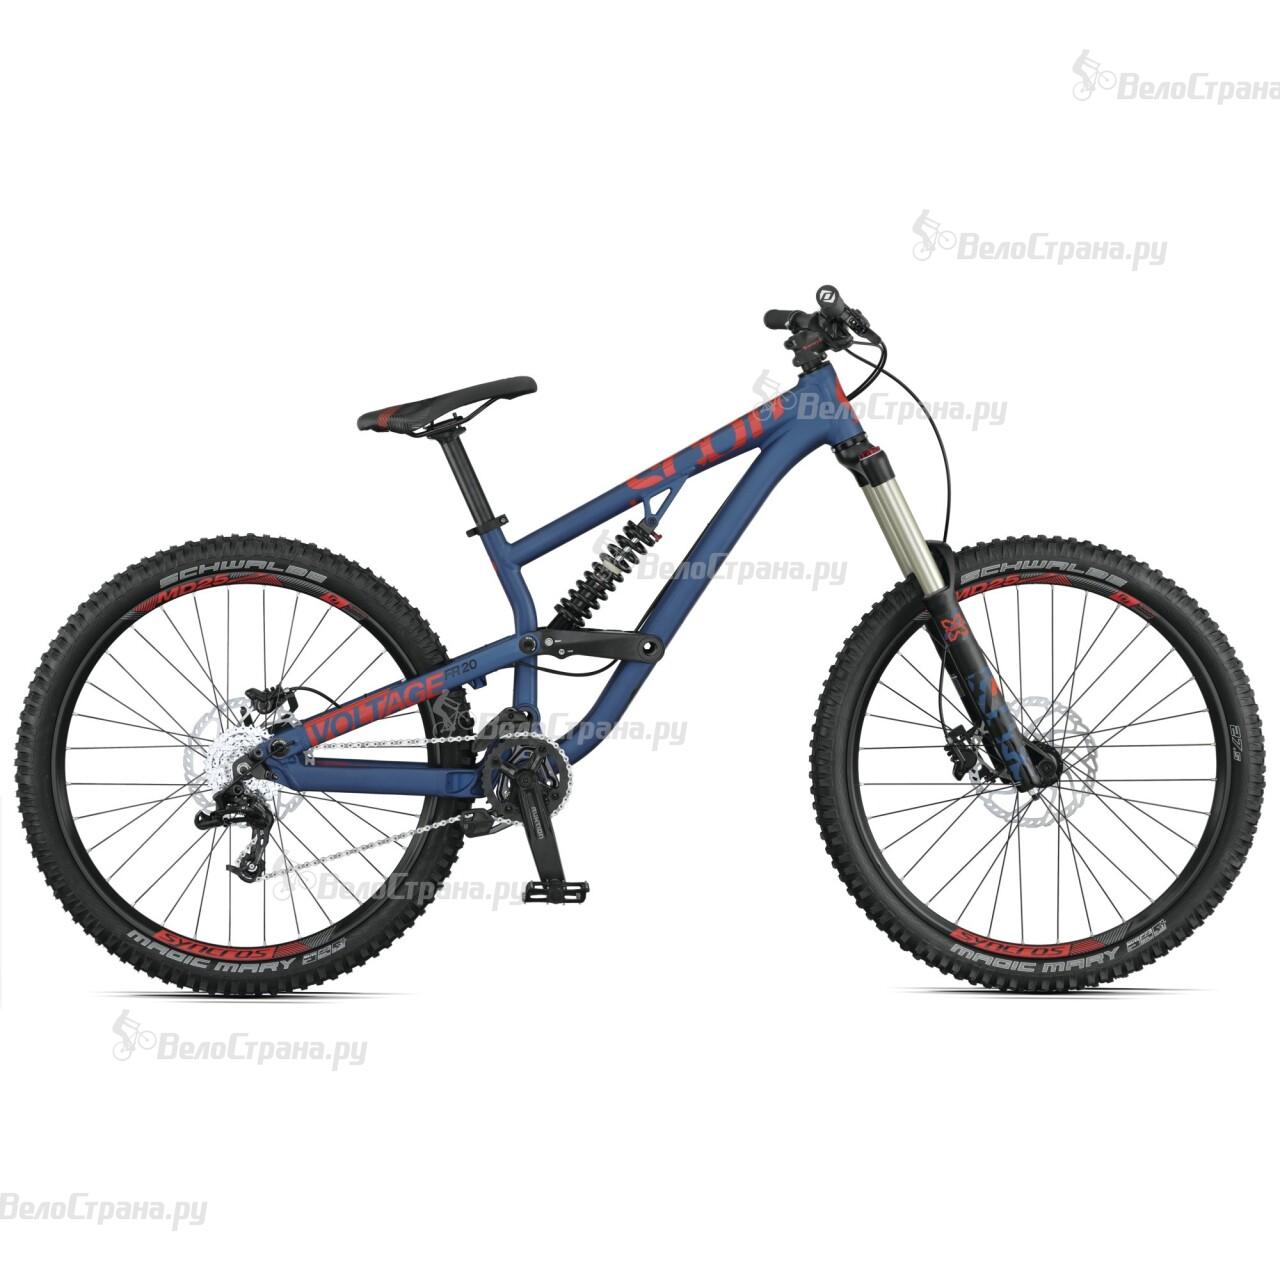 Велосипед Scott VOLTAGE FR 730 (2015) велосипед scott gambler 730 2015